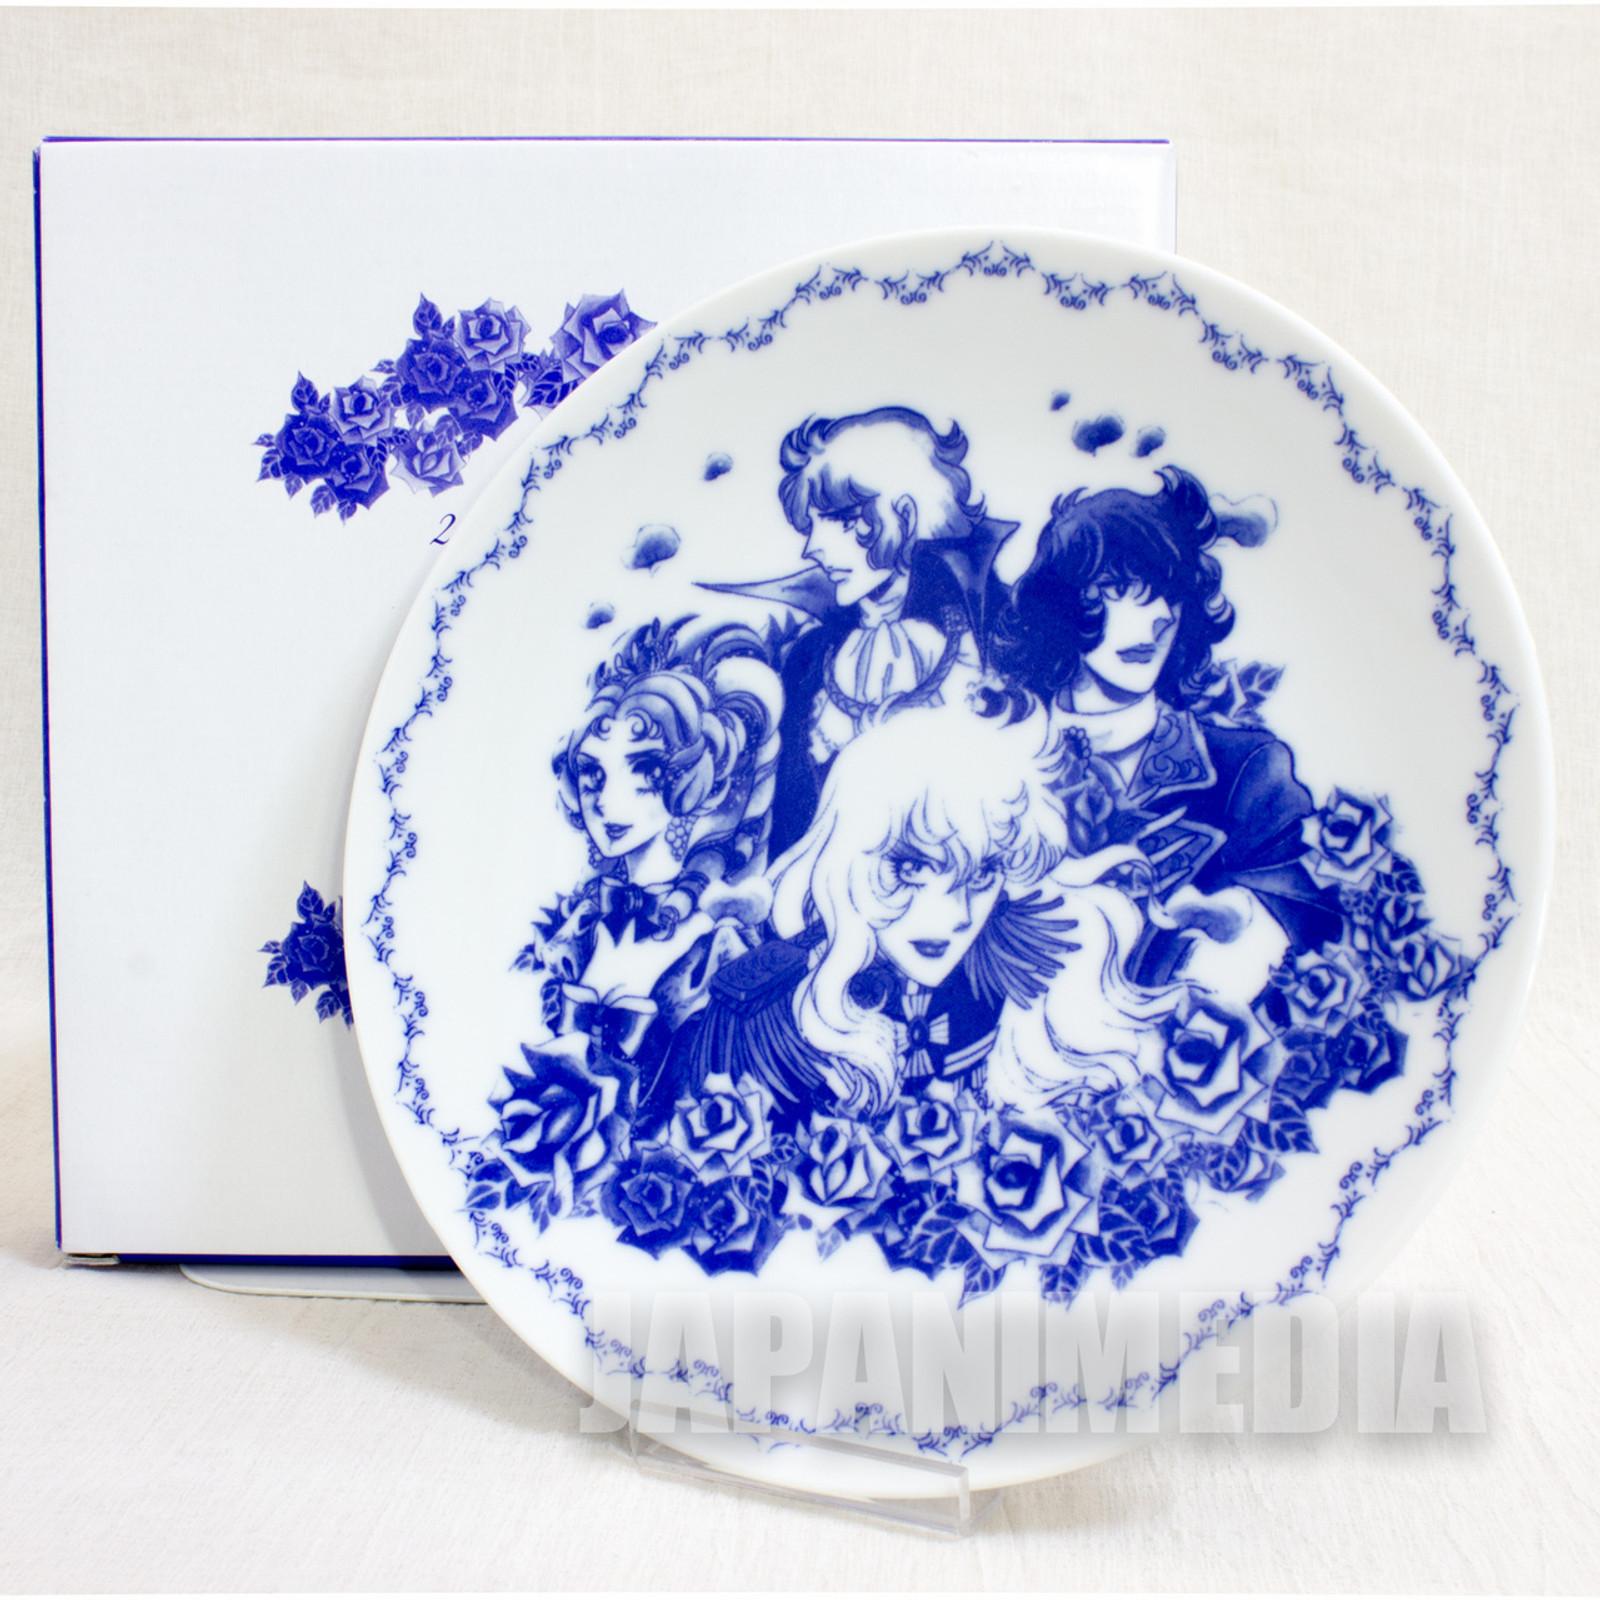 RARE! The Rose of Versailles Dish Plate Hankyu Sanbangai JAPAN ANIME MANGA